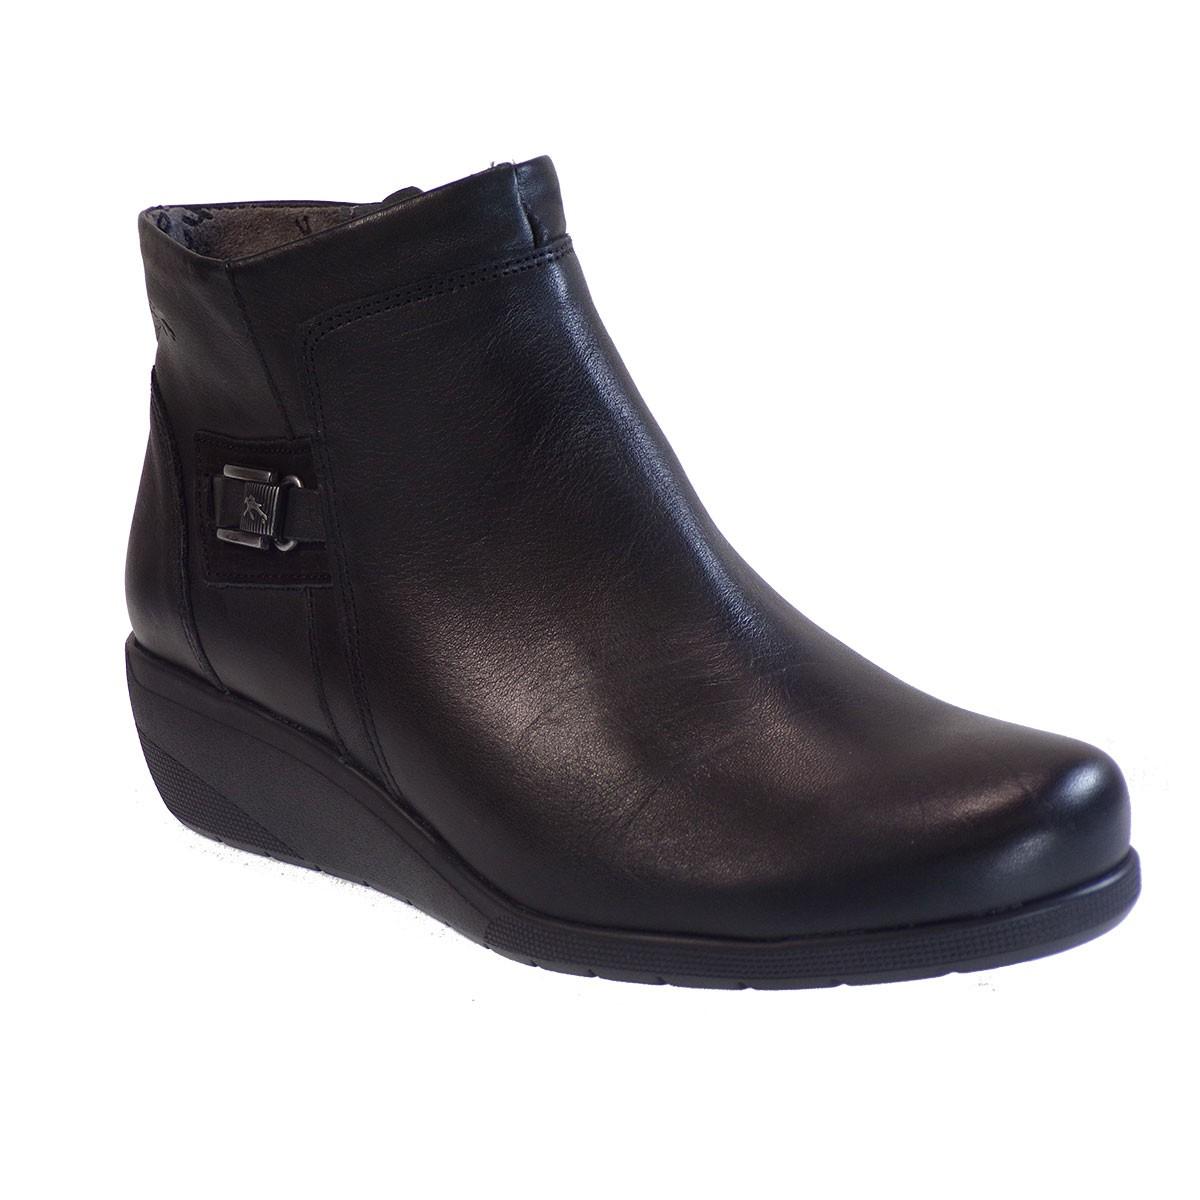 Fluchos Femme Γυναικεία Παπούτσια Μποτάκια F0595-34559 Μαύρο Δέρμα